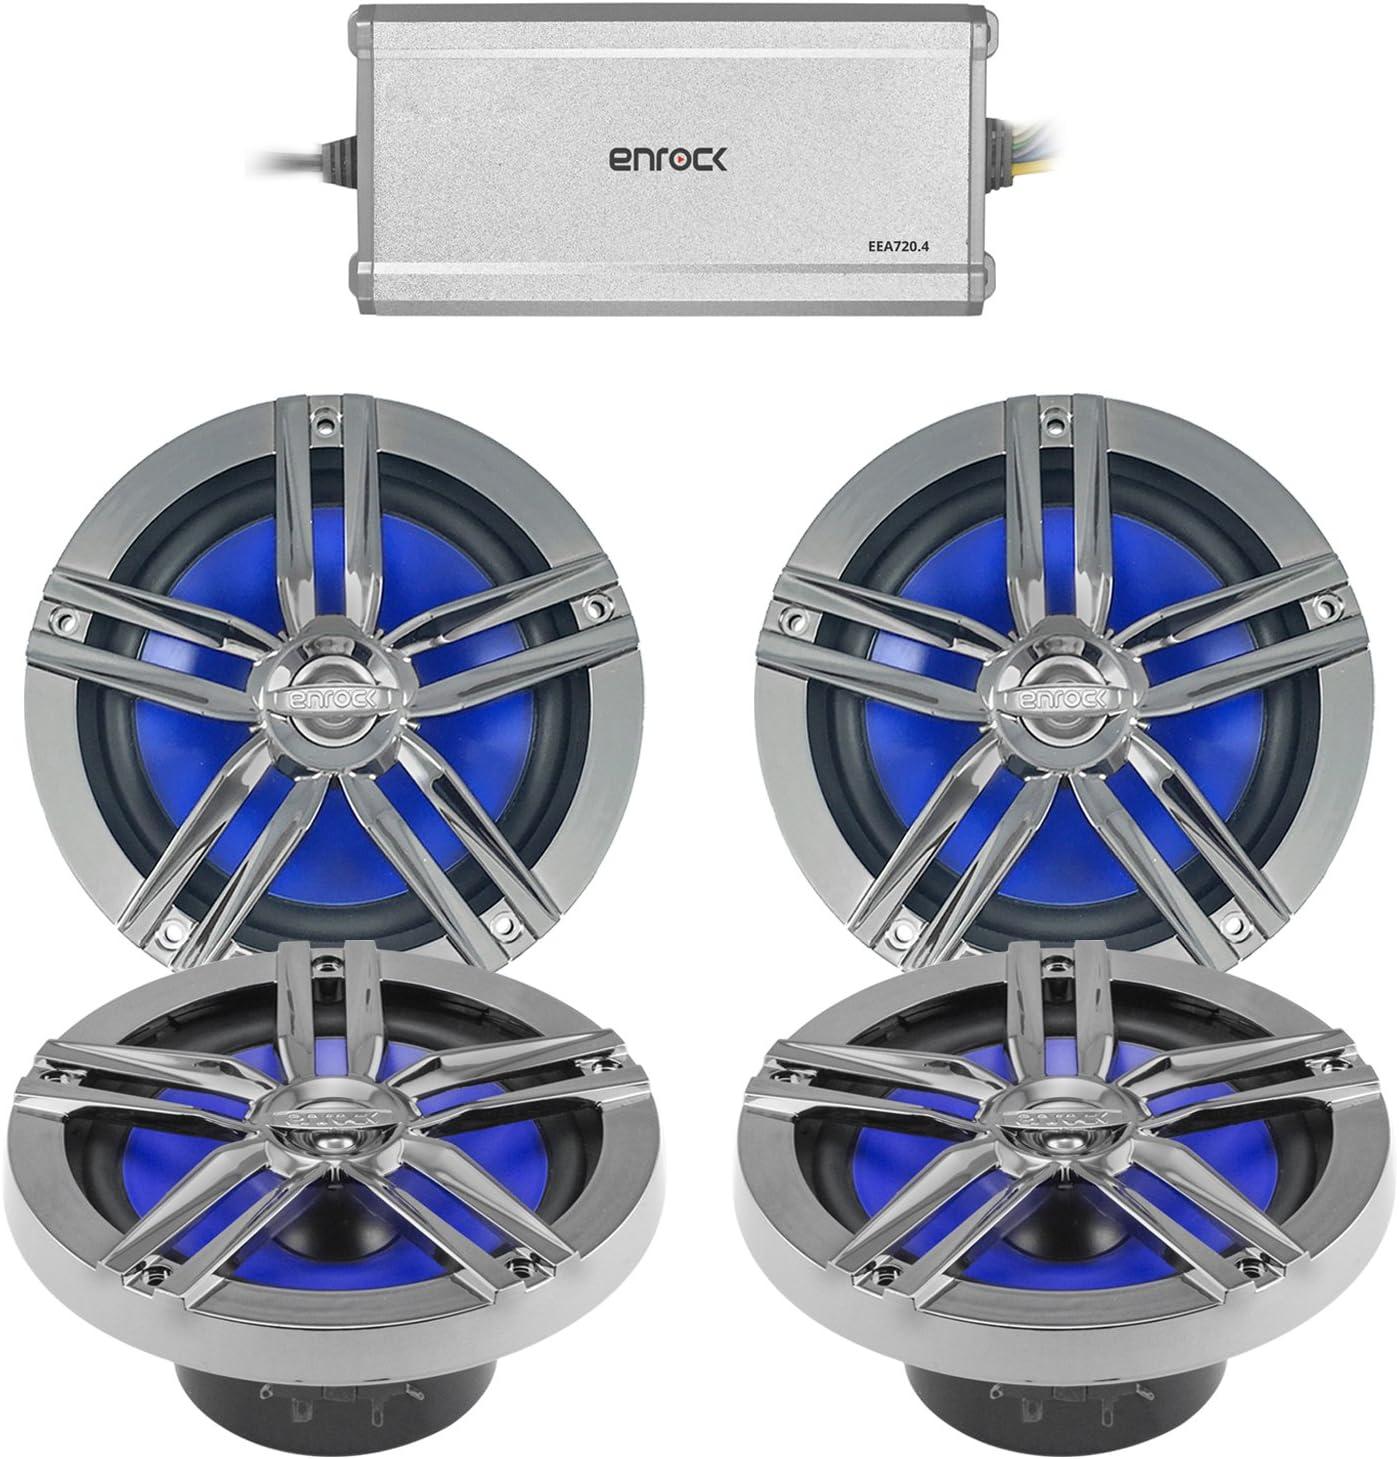 Enrock Marine 4-Channel Marine//Power Sports Amplifier Charcoal 2 Pairs 2 x Enrock Marine 180-Watts High-Performance 6.5 Water-Resistant Loudspeakers